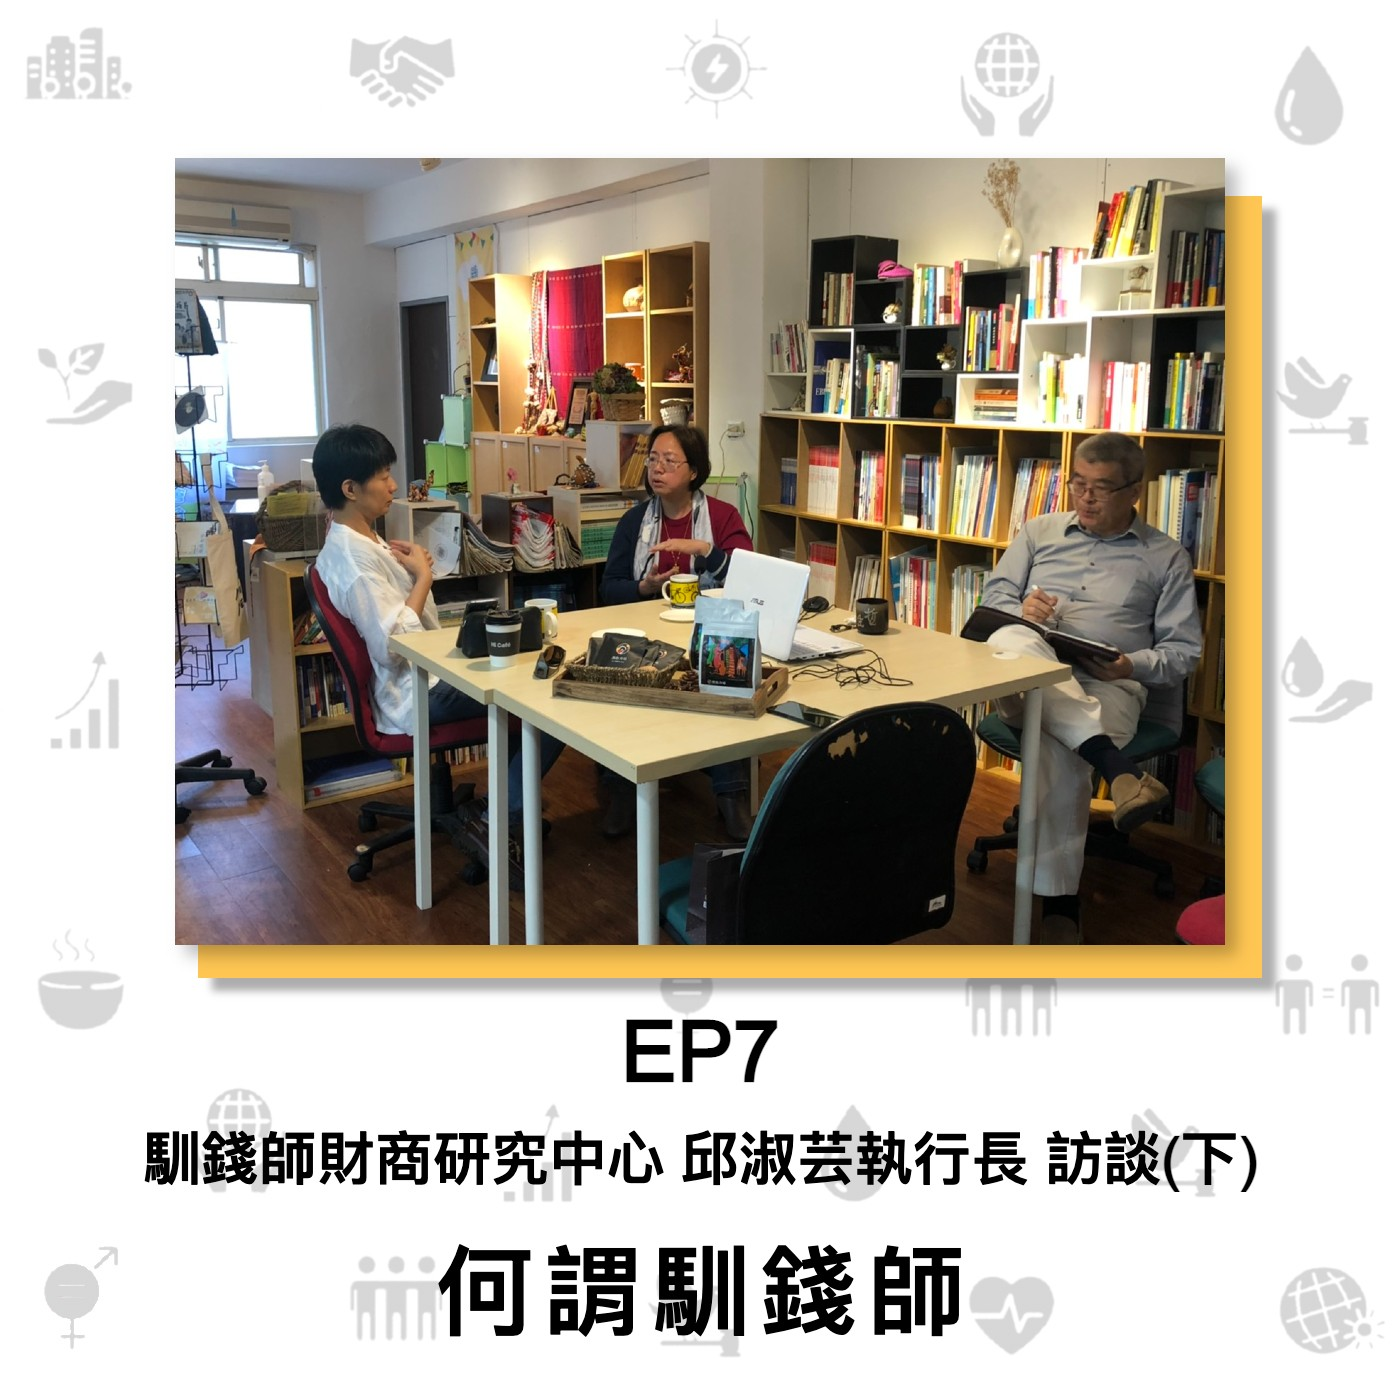 EP7:馴錢師財商研究中心 邱淑芸執行長 訪談(下):何謂馴錢師